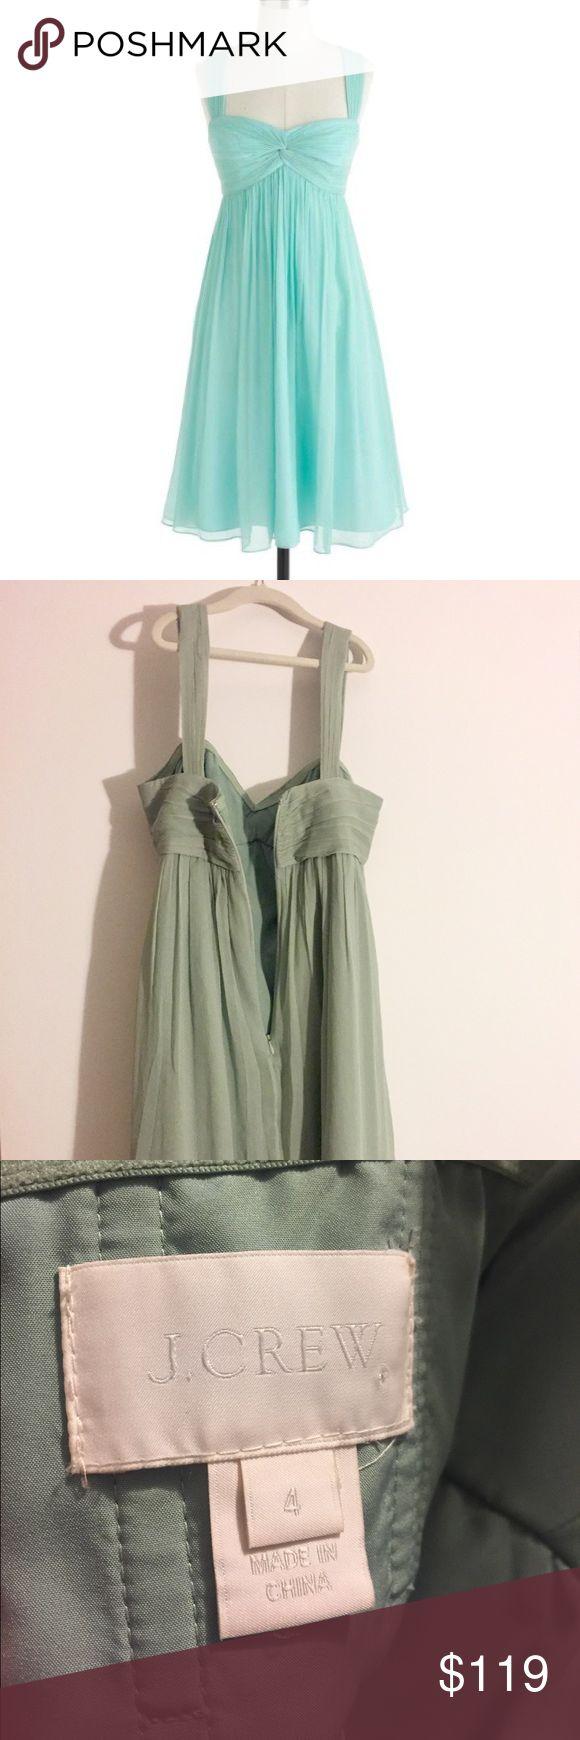 J. Crew seafoam green silk dress. Size 4. Mint condition. Hue is green/blue. J. Crew Dresses